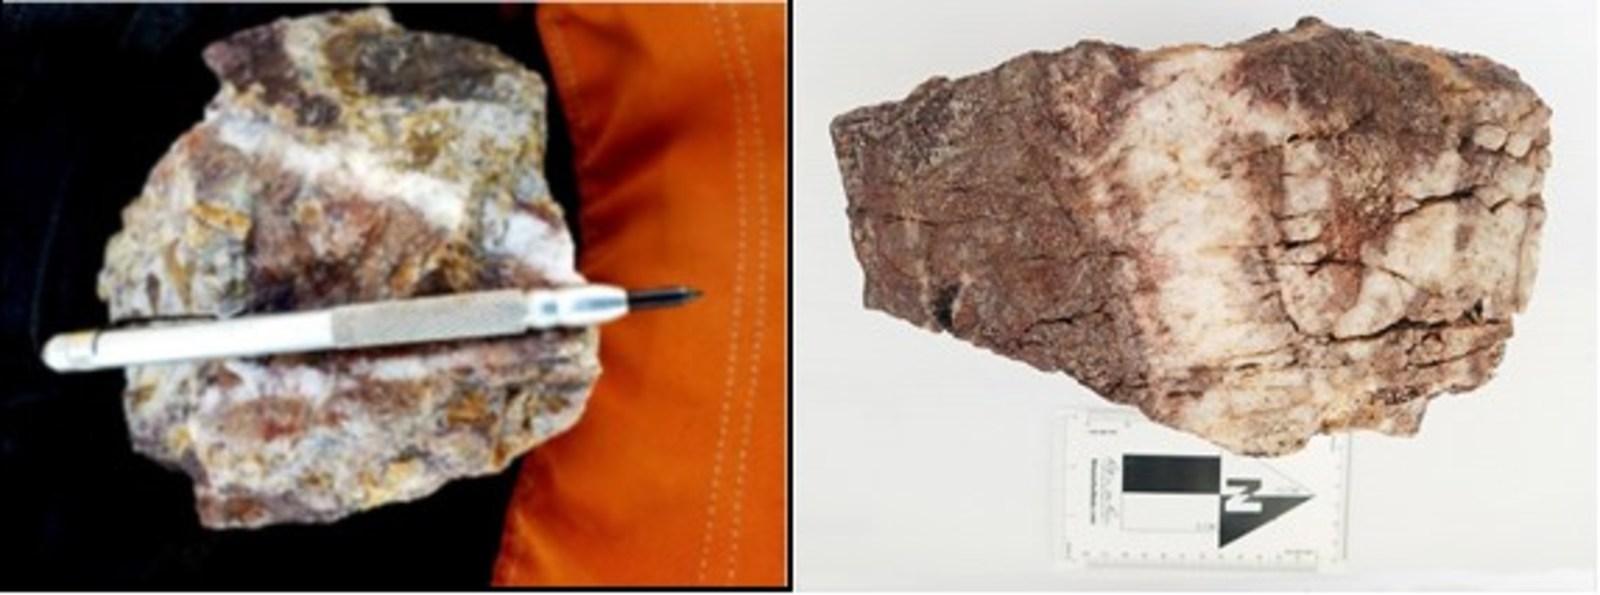 Figure 5 Nava Zone – Epithermal Stockwork Quartz Veinlets with Boxworks of Hematite